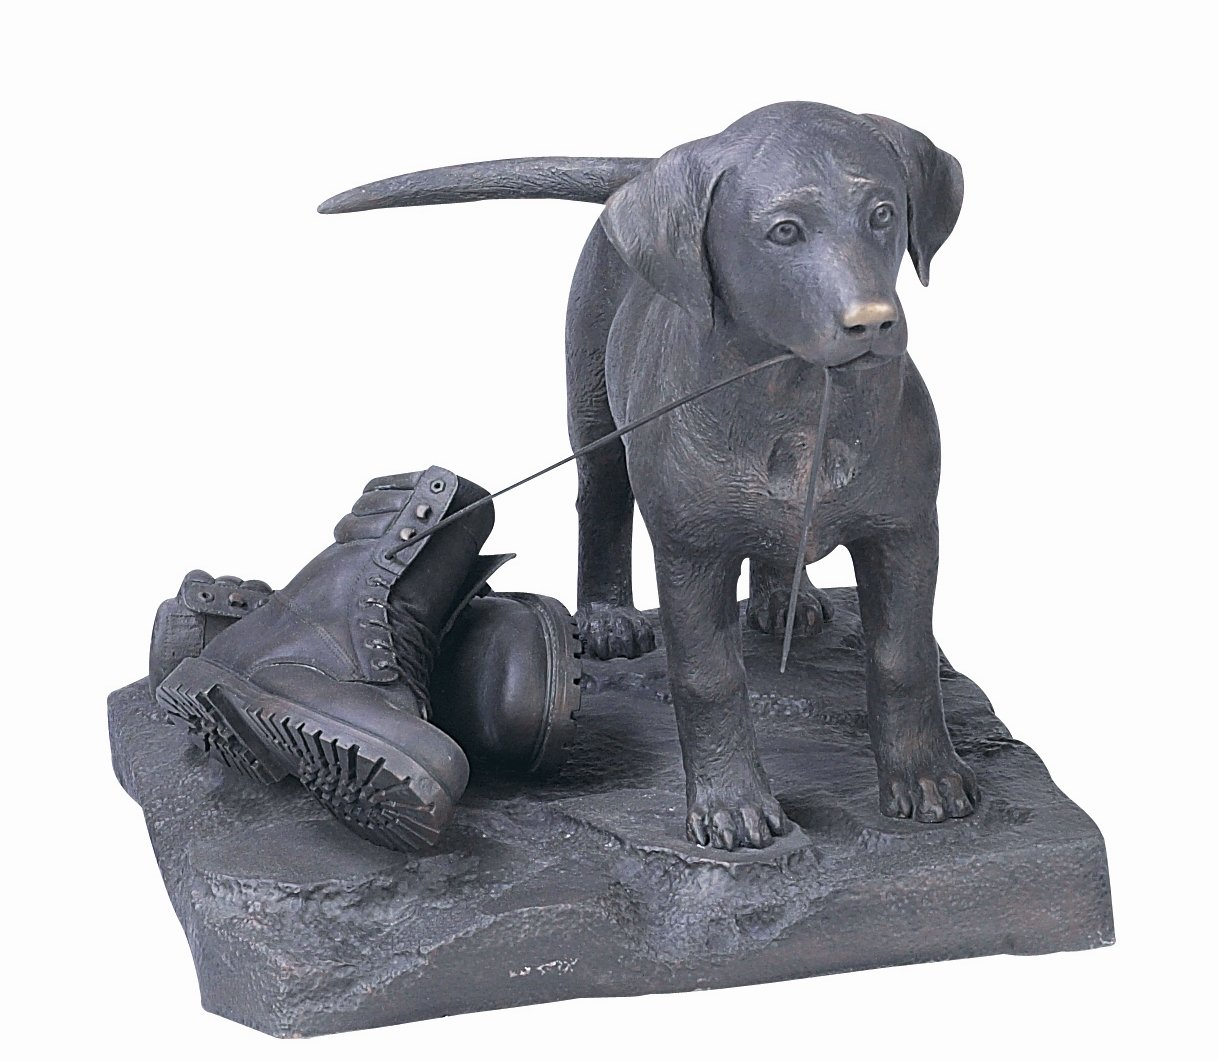 World of American Home Decor Warehouse RGA0491 Labrador 'Lab' Puppy Limited Edition Bronze Dog Statue, 28/23/23-Inch